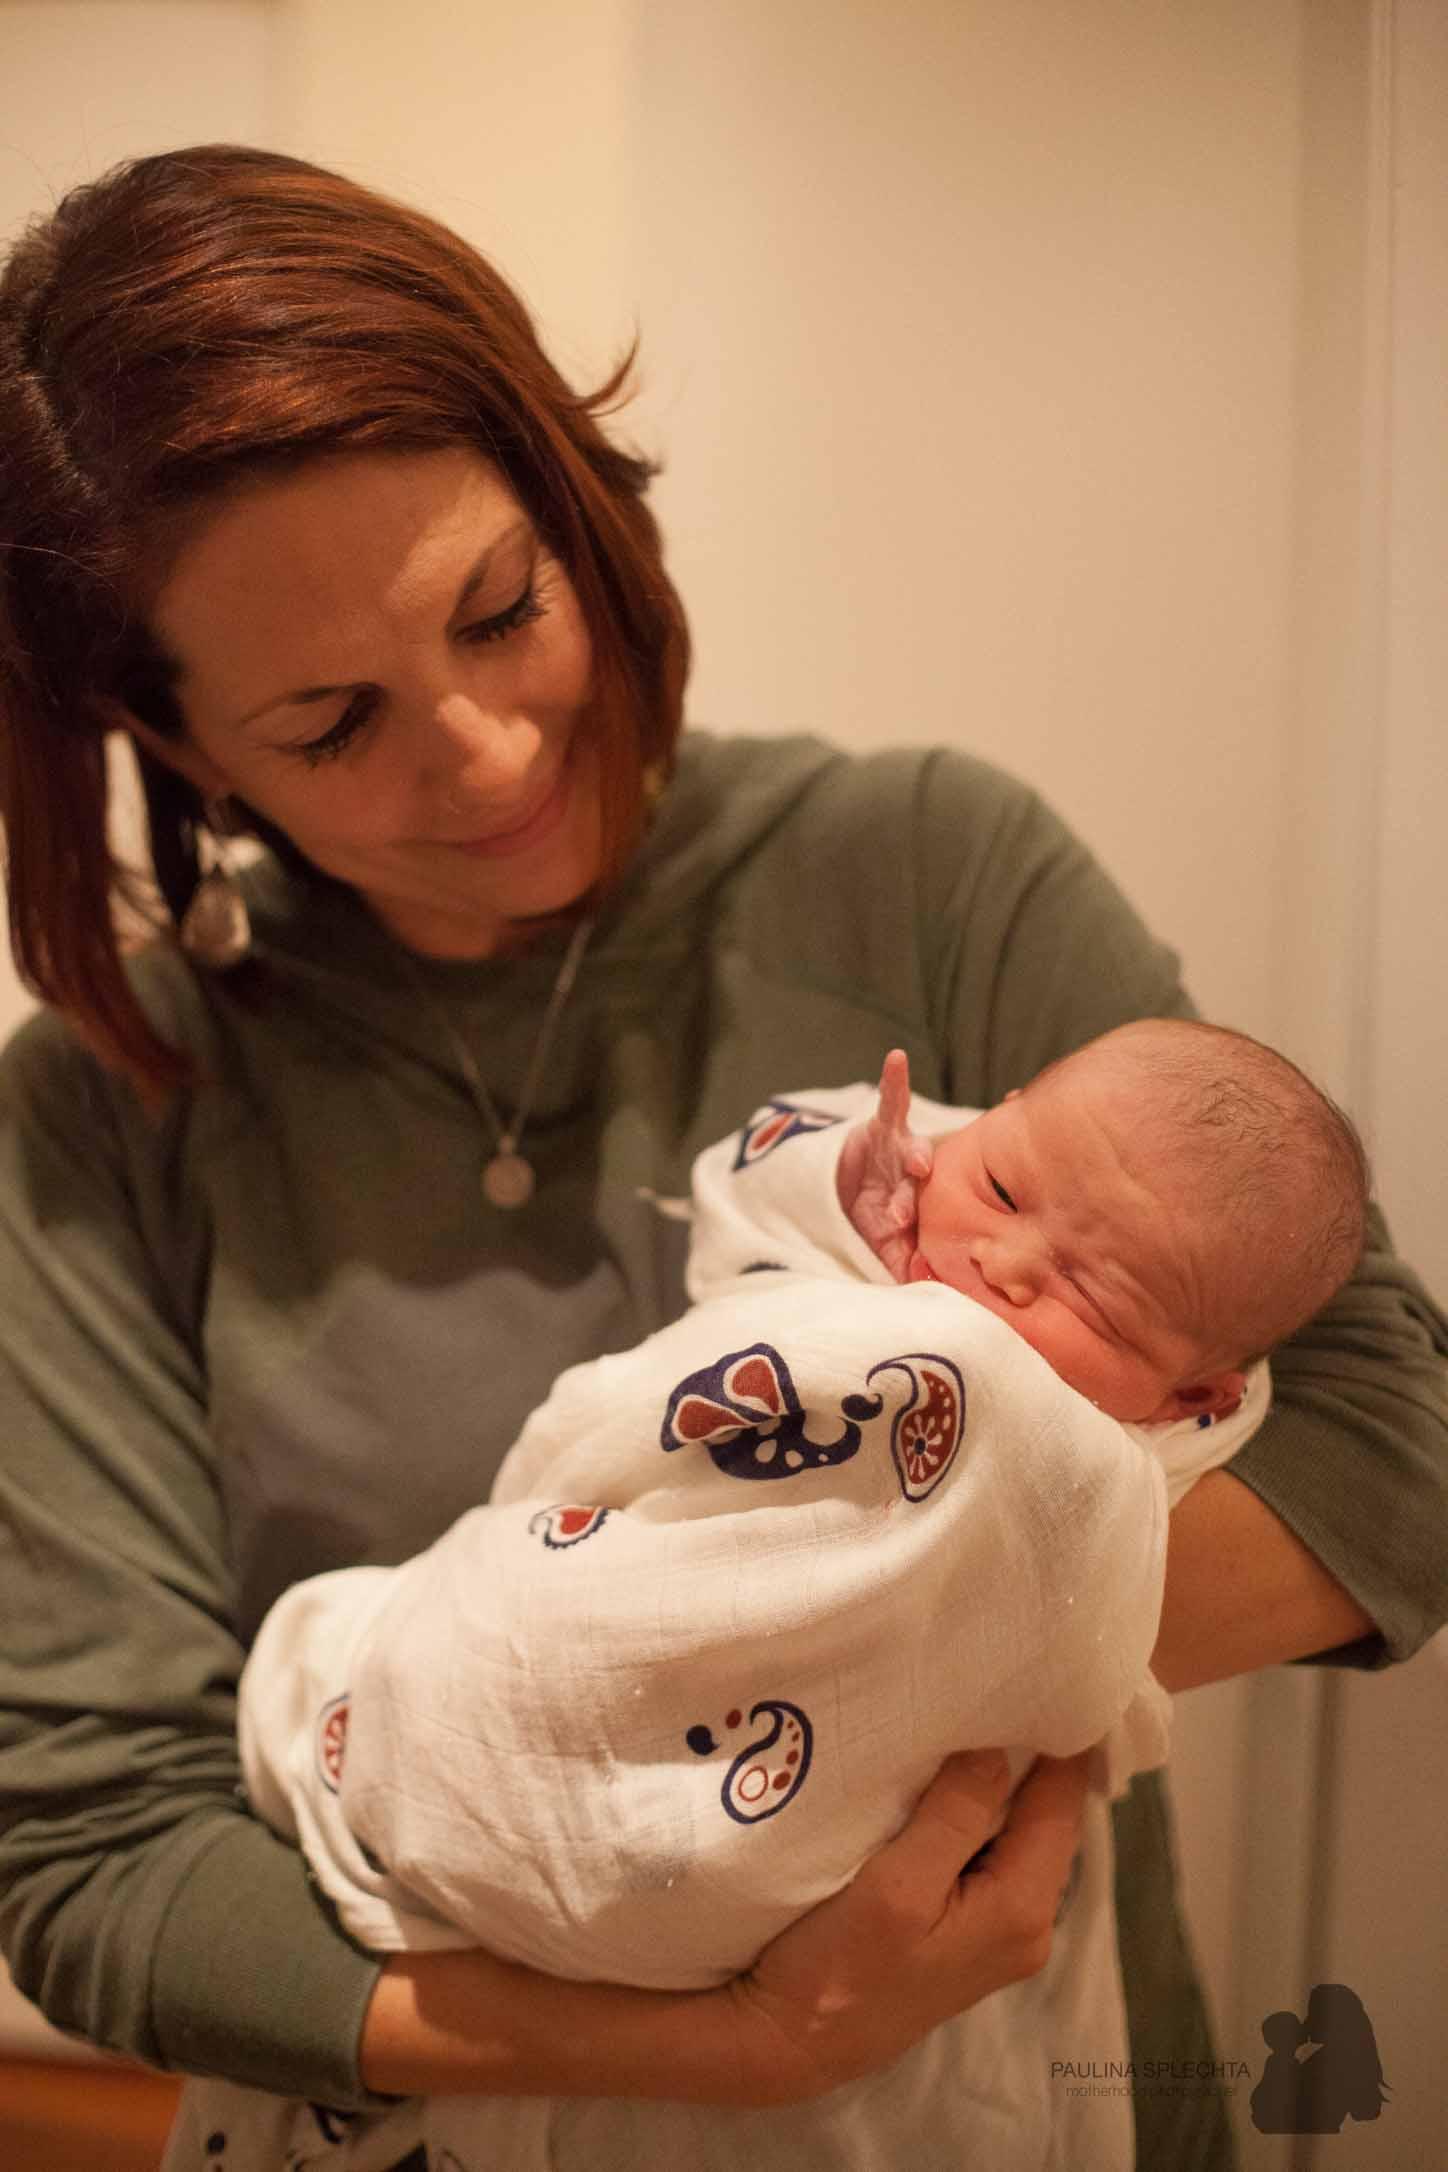 birth-photographer-boca-photography-near-me-birth-center-delray-beach-hollywood-breastfeeding-doula-midwife-childbirth-35.jpg